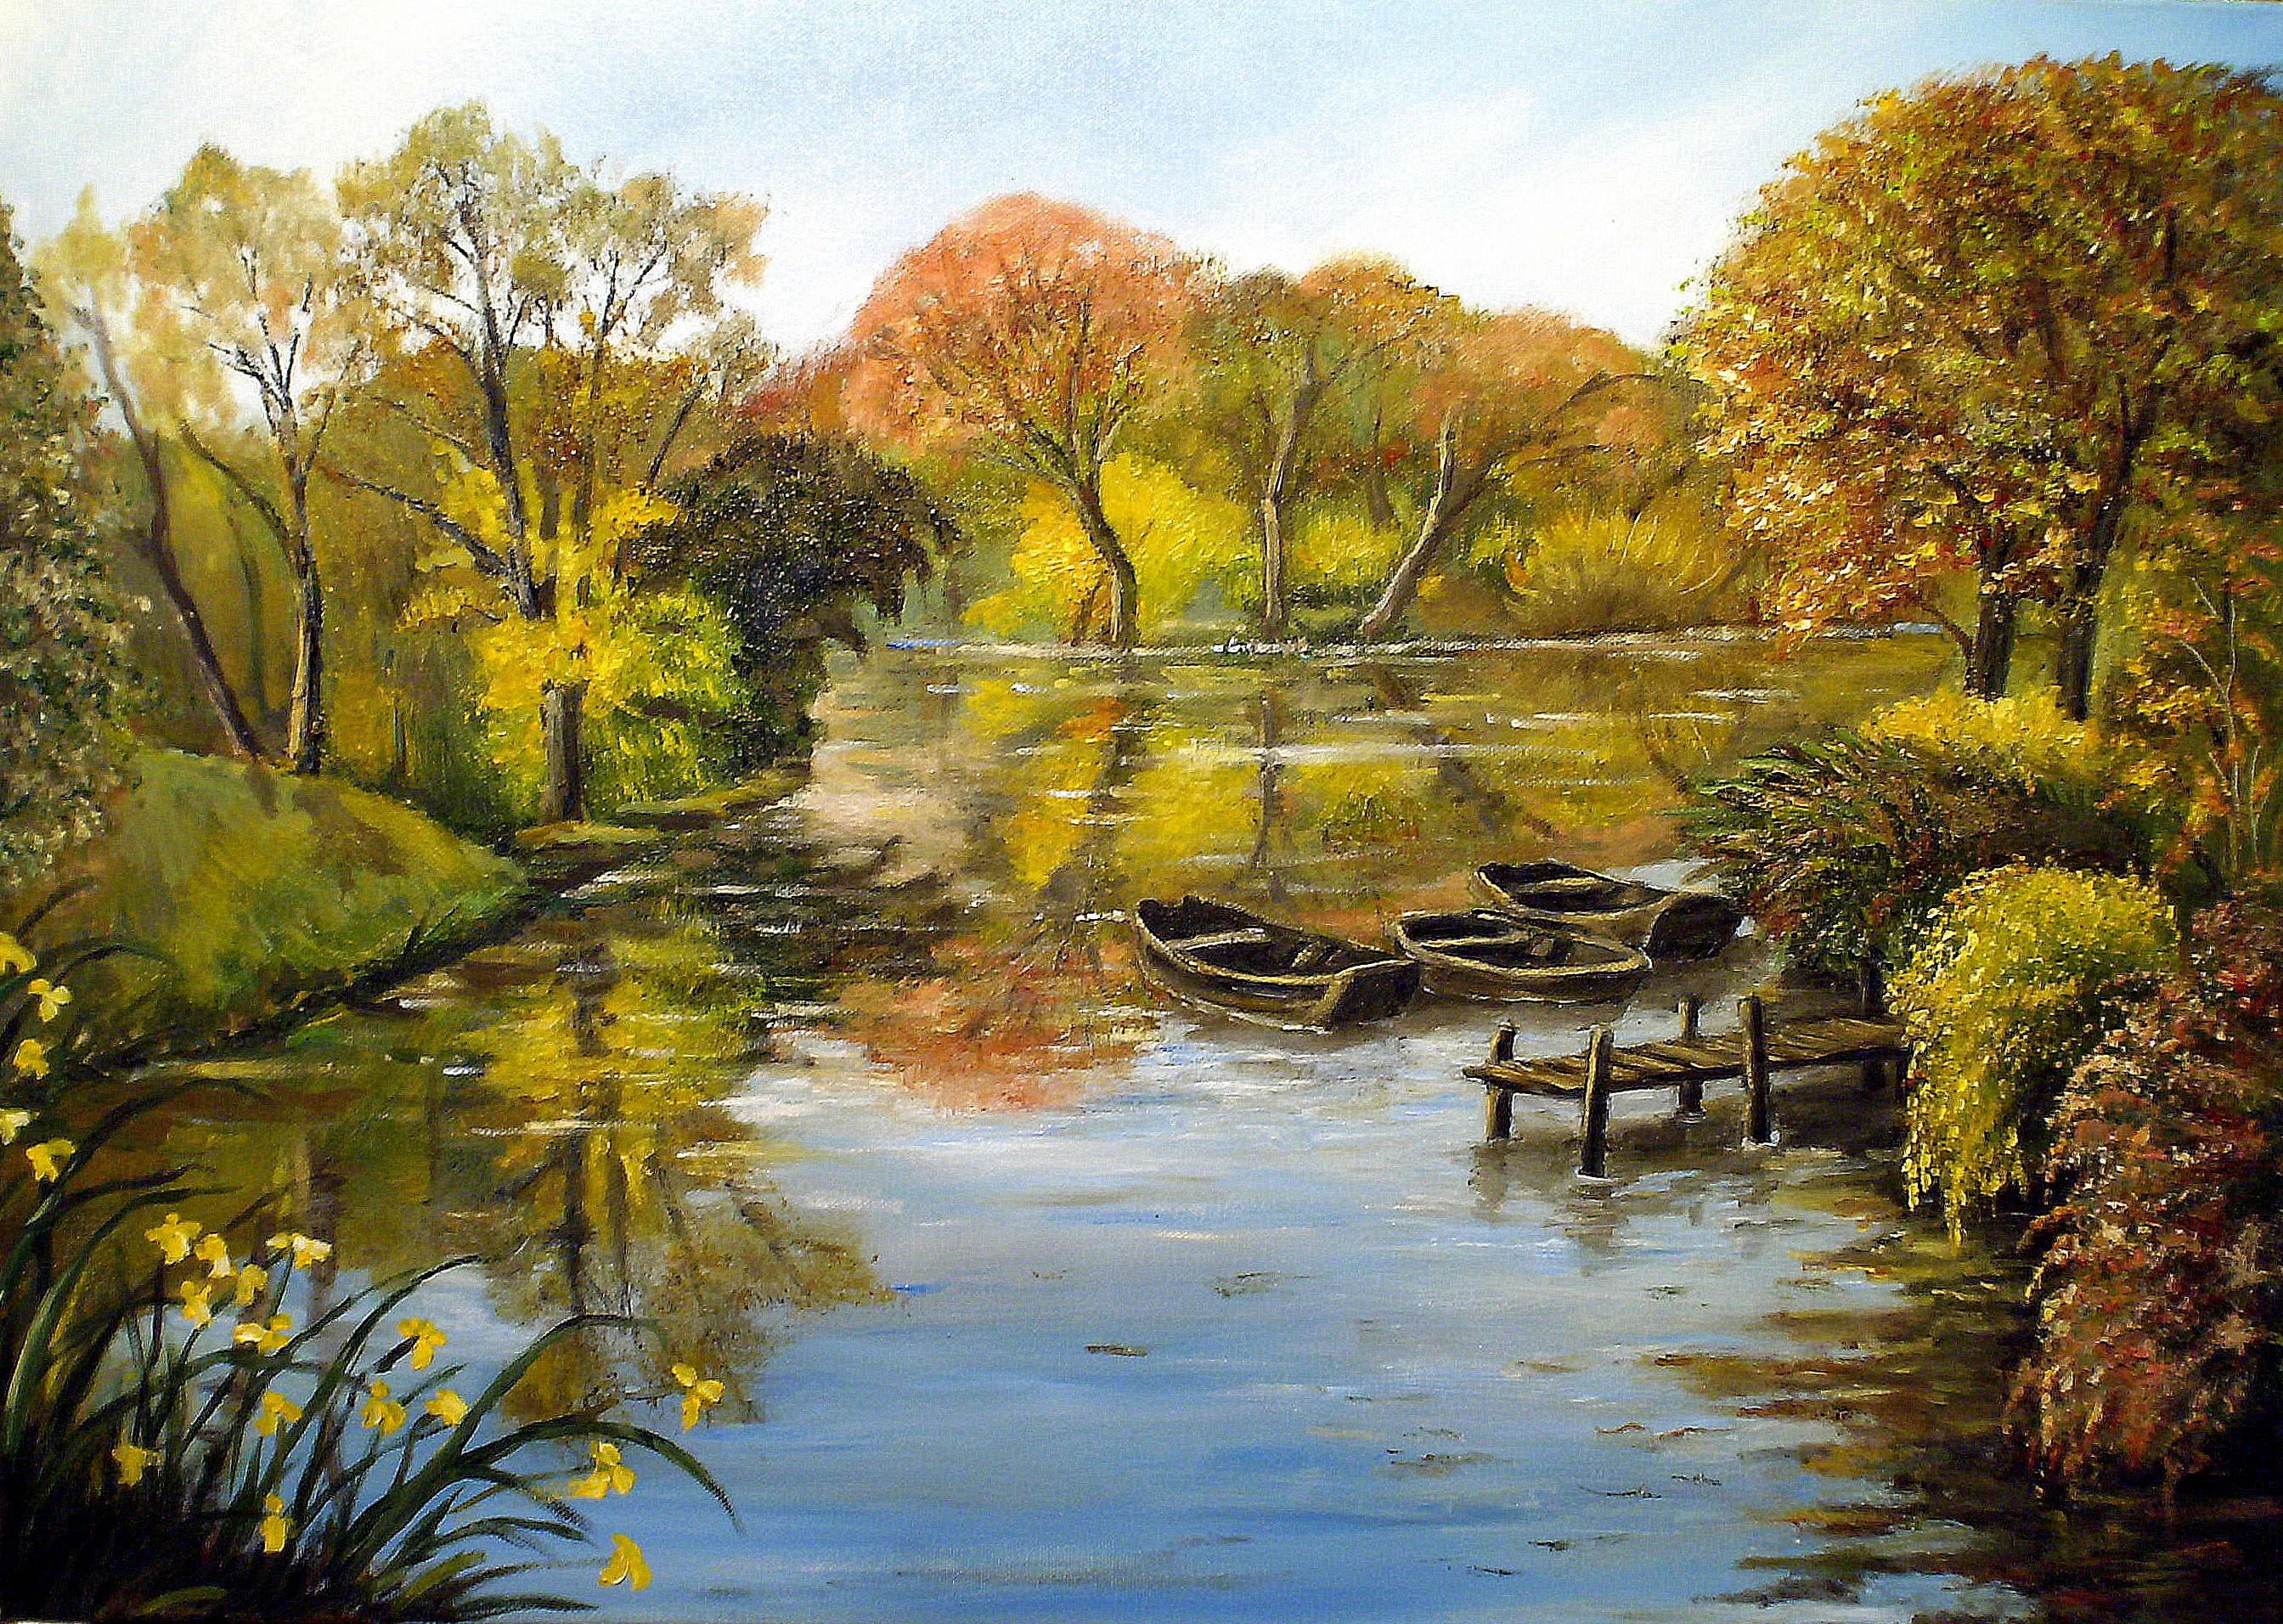 Emejing tableaux paysages campagne gallery joshkrajcik for Paysage peinture